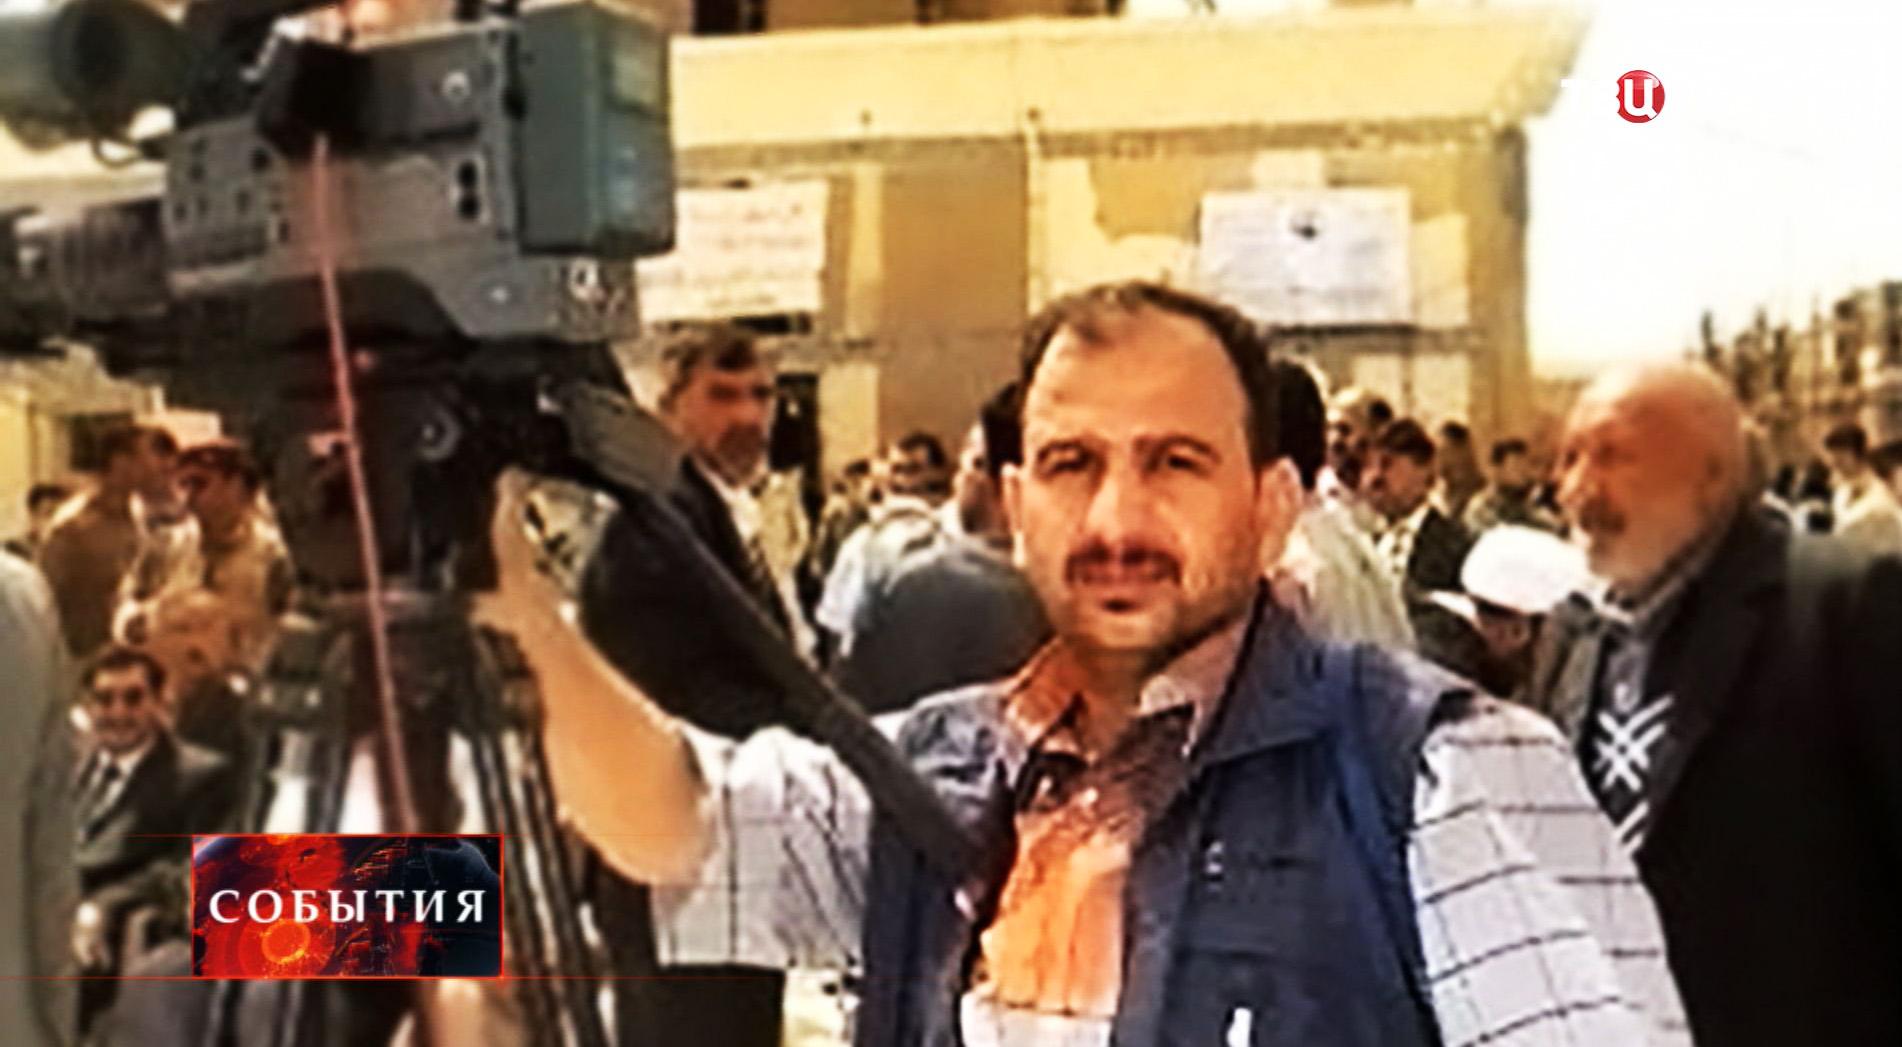 Раад Мухамед аль-Азауи